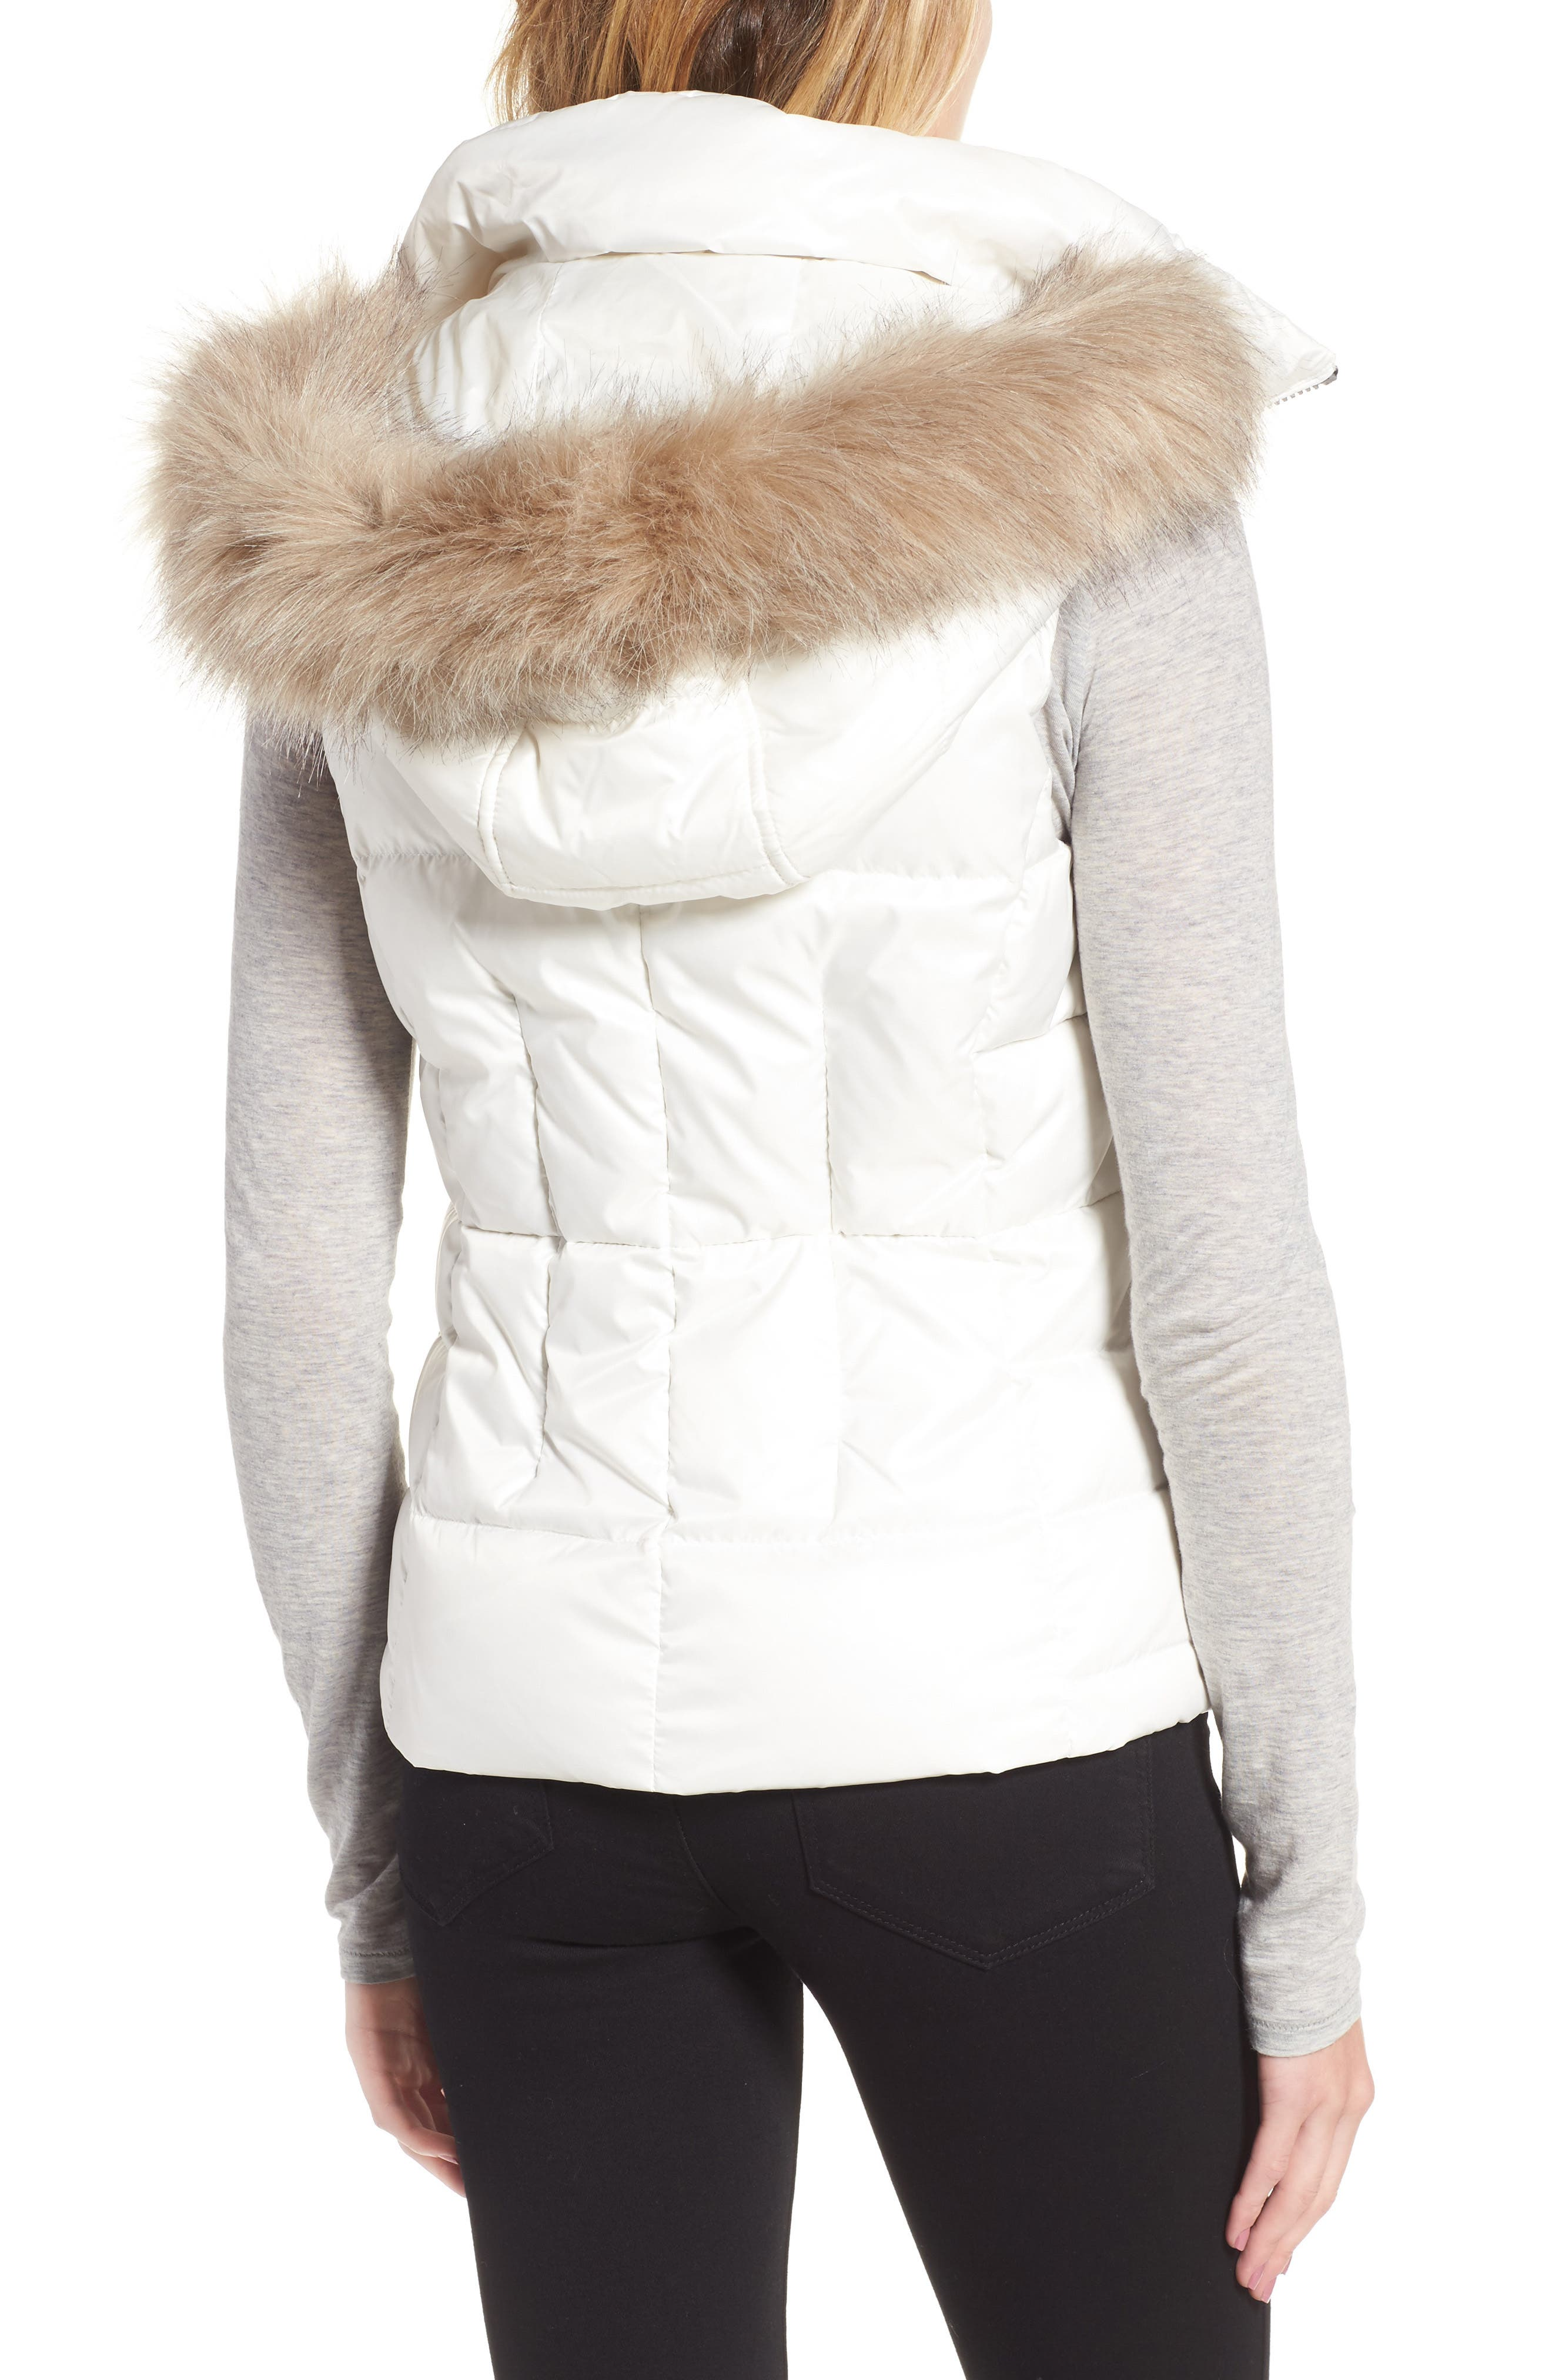 Lanie Puffer Vest with Faux Fur,                             Alternate thumbnail 2, color,                             100